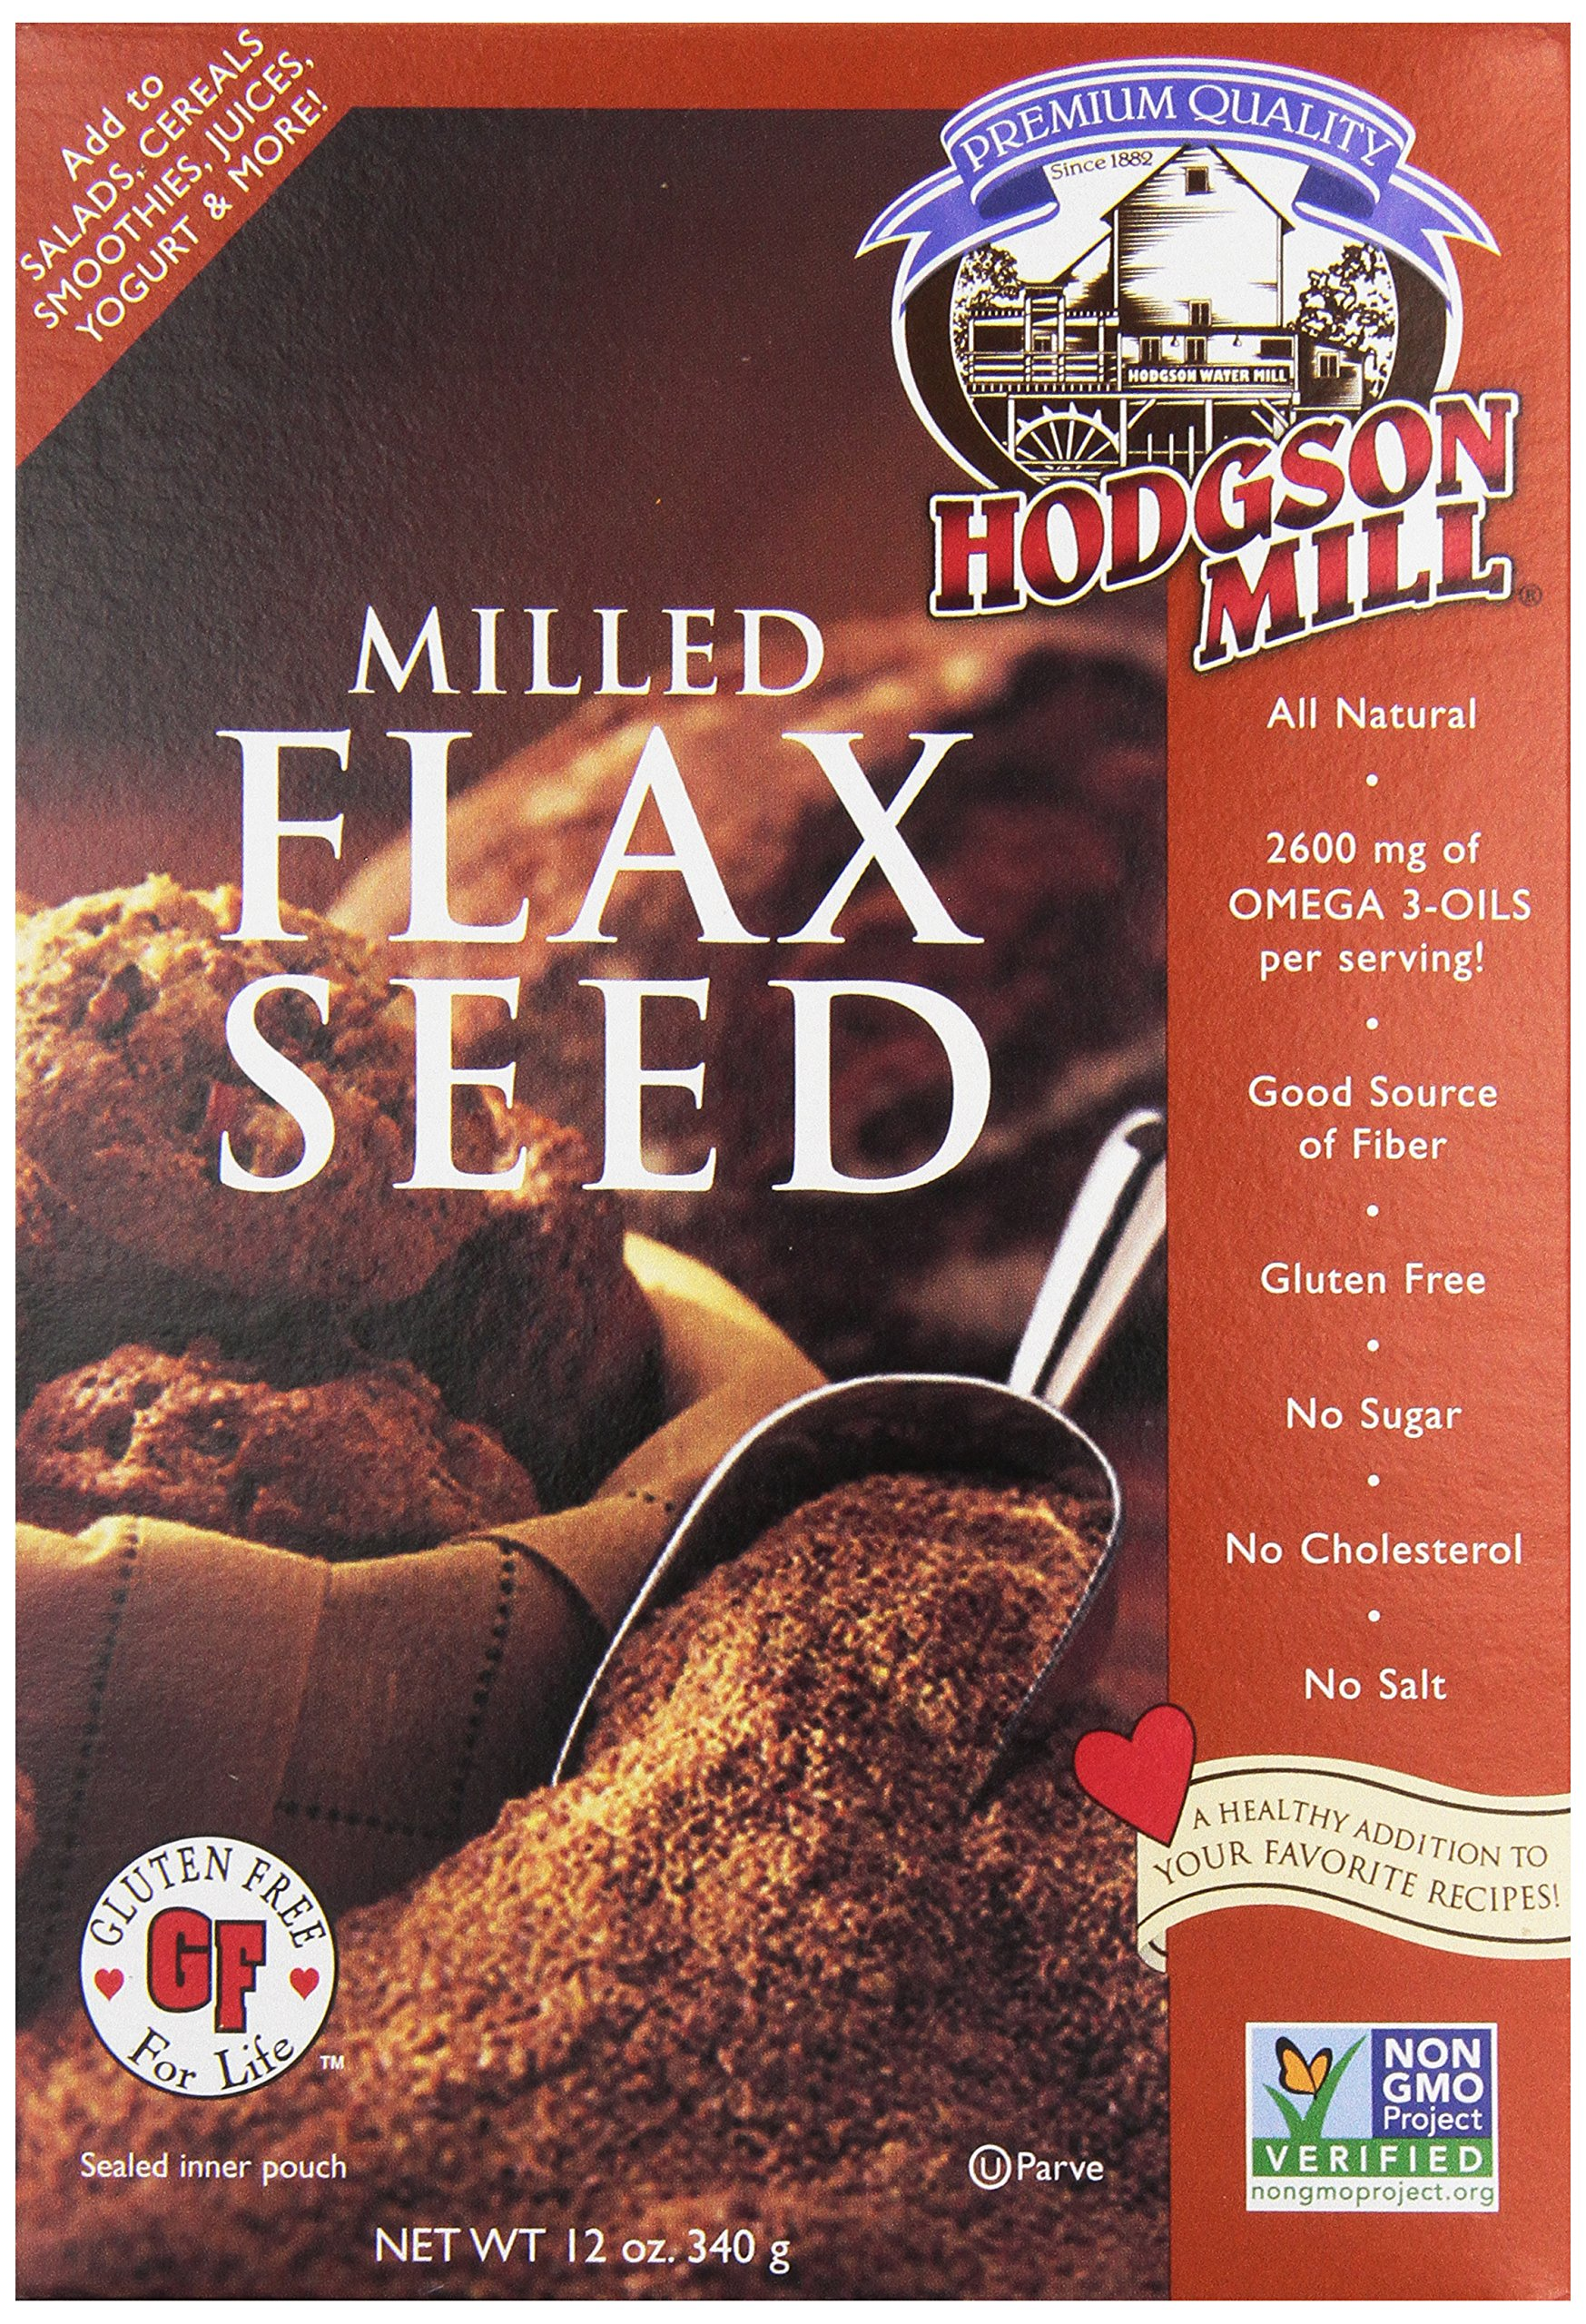 Hodgson Milled Flax Seed, 12 oz